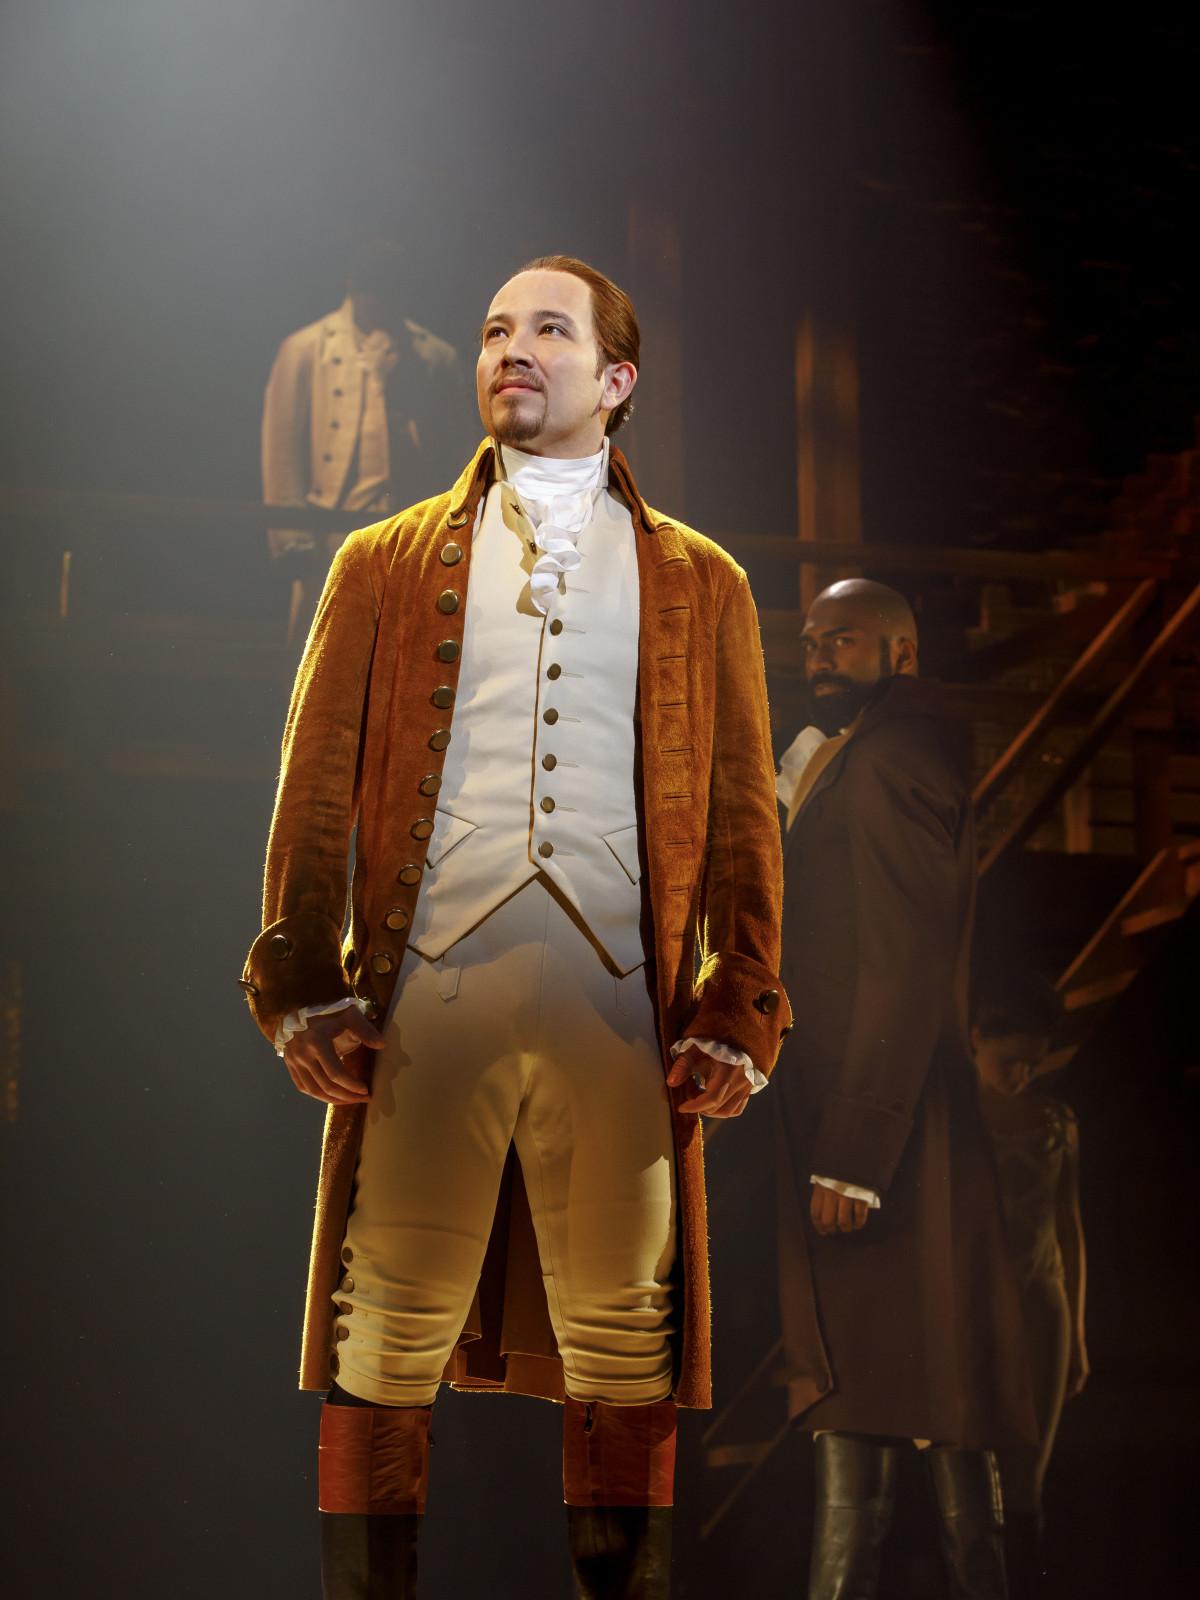 Joseph Morales in Hamilton national tour